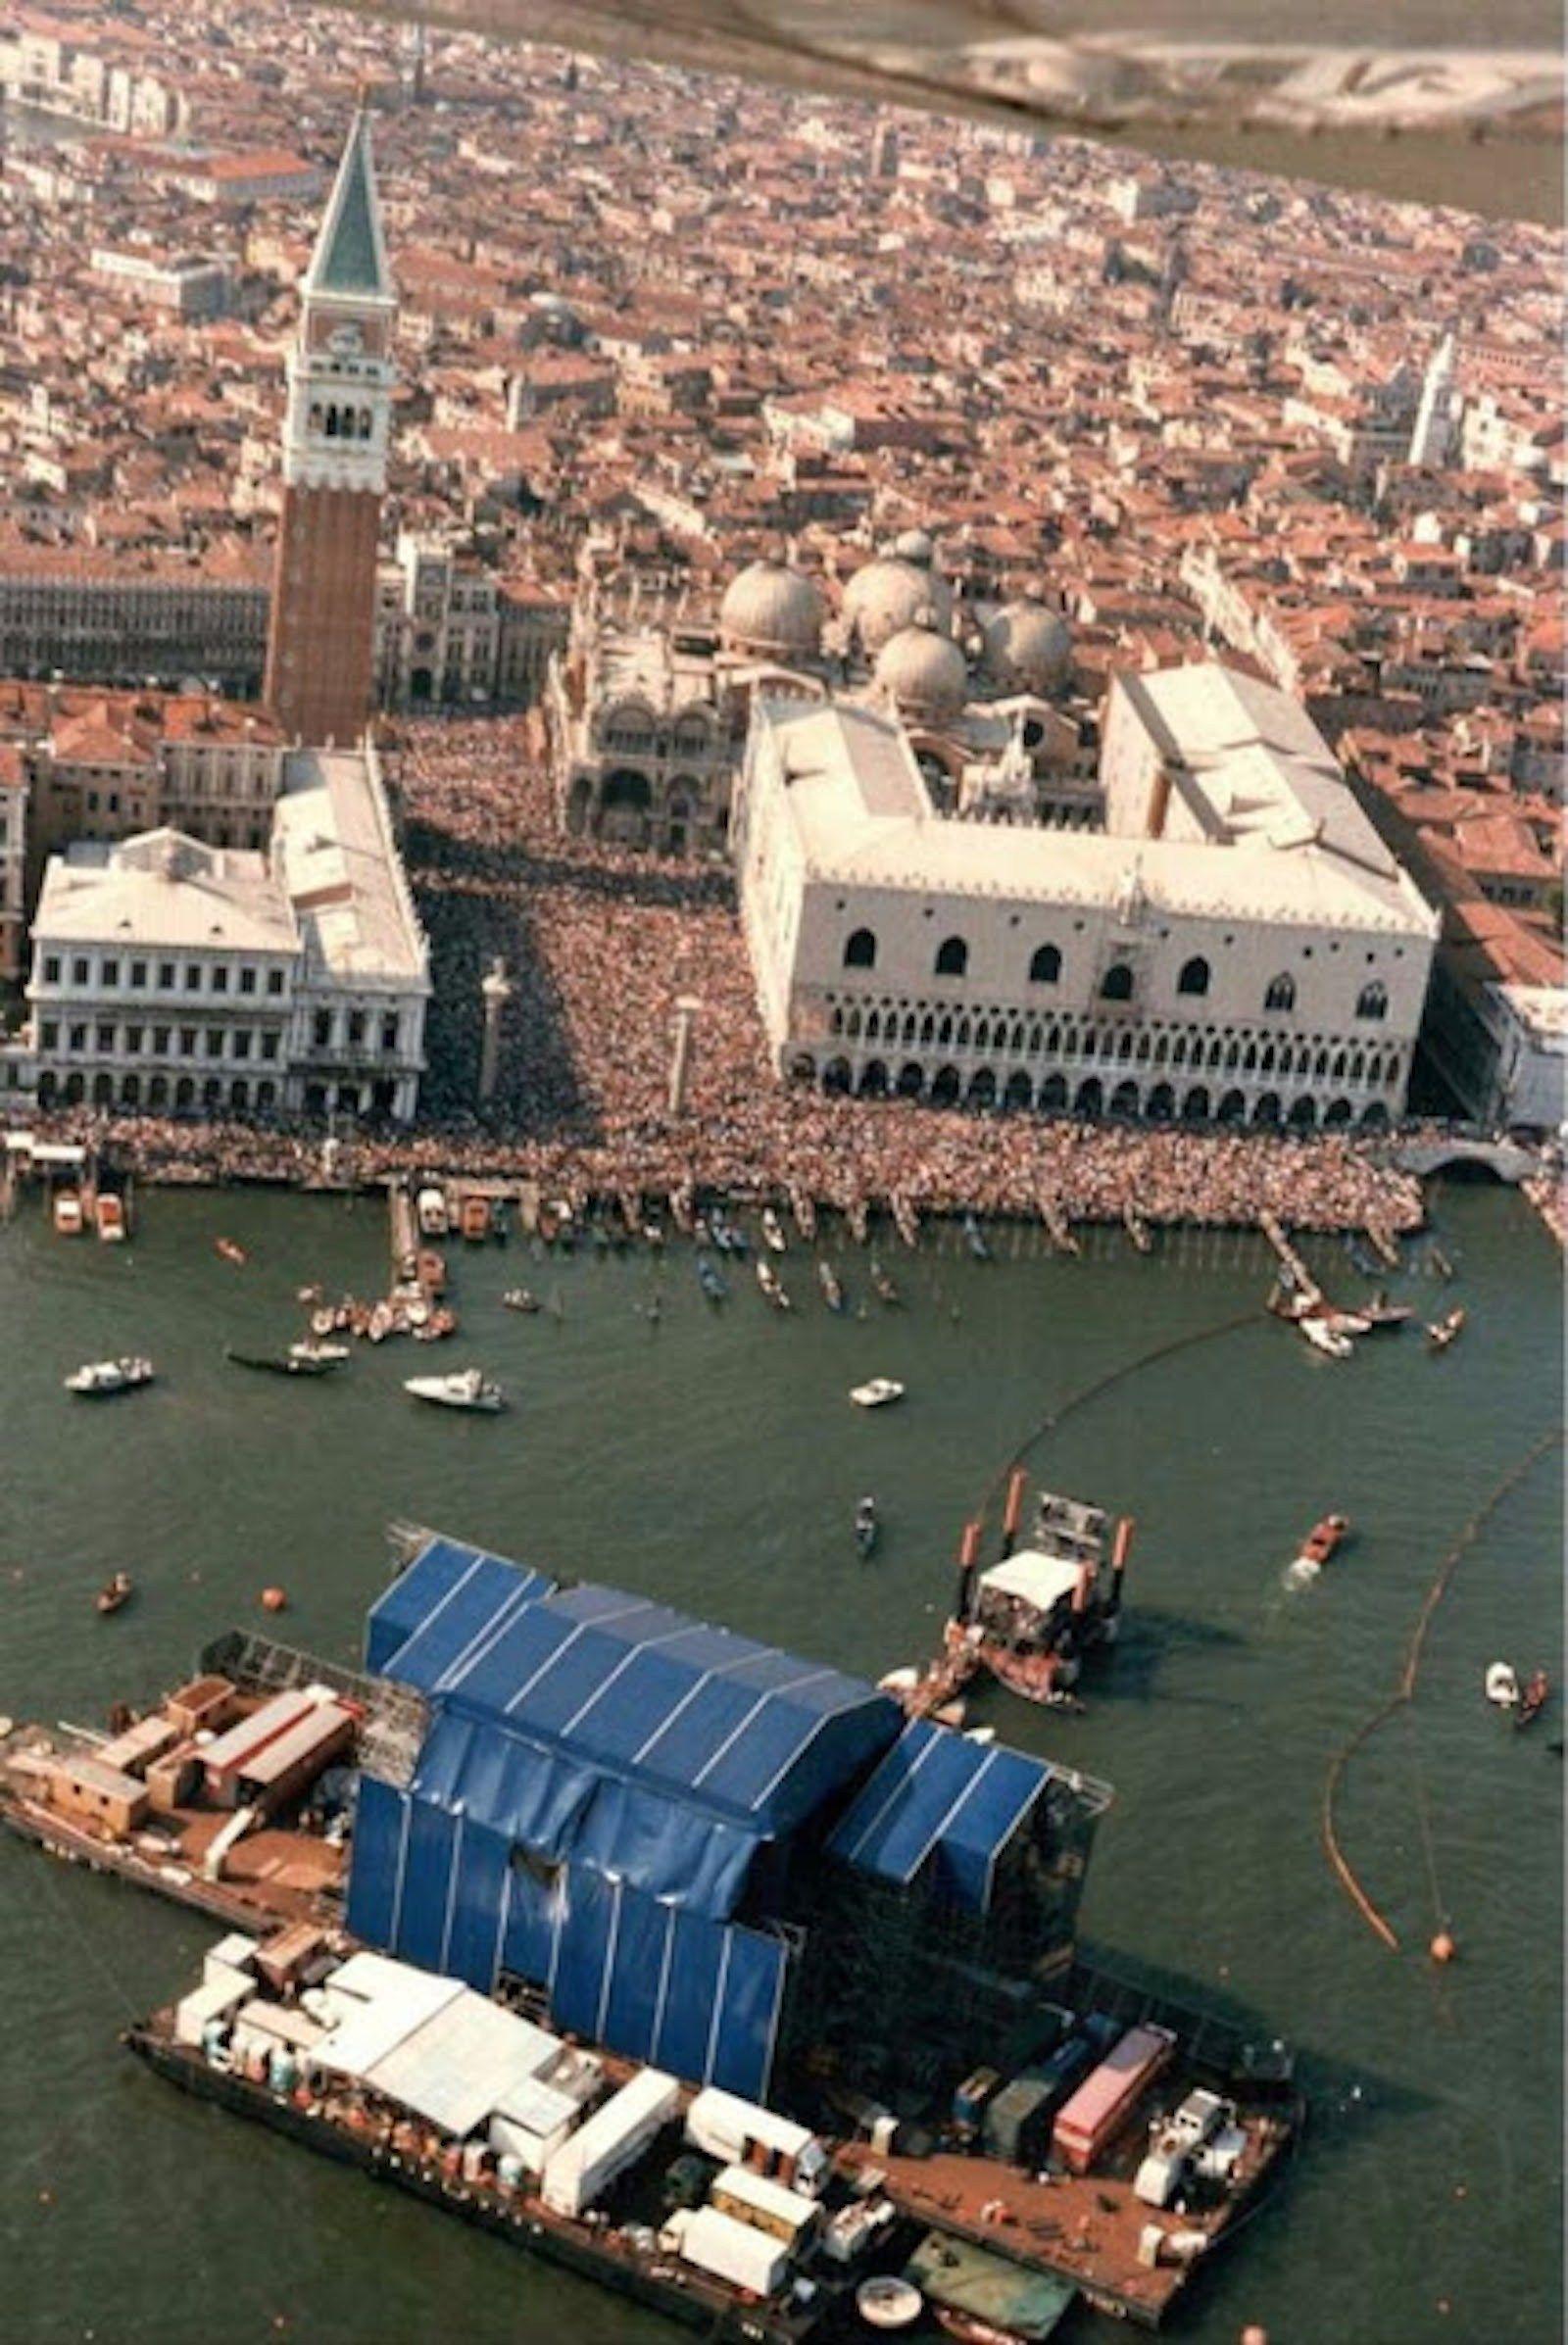 Грандиозное шоу Пинк Флойд в Венеции, 15.07.1989 (26 фото ...